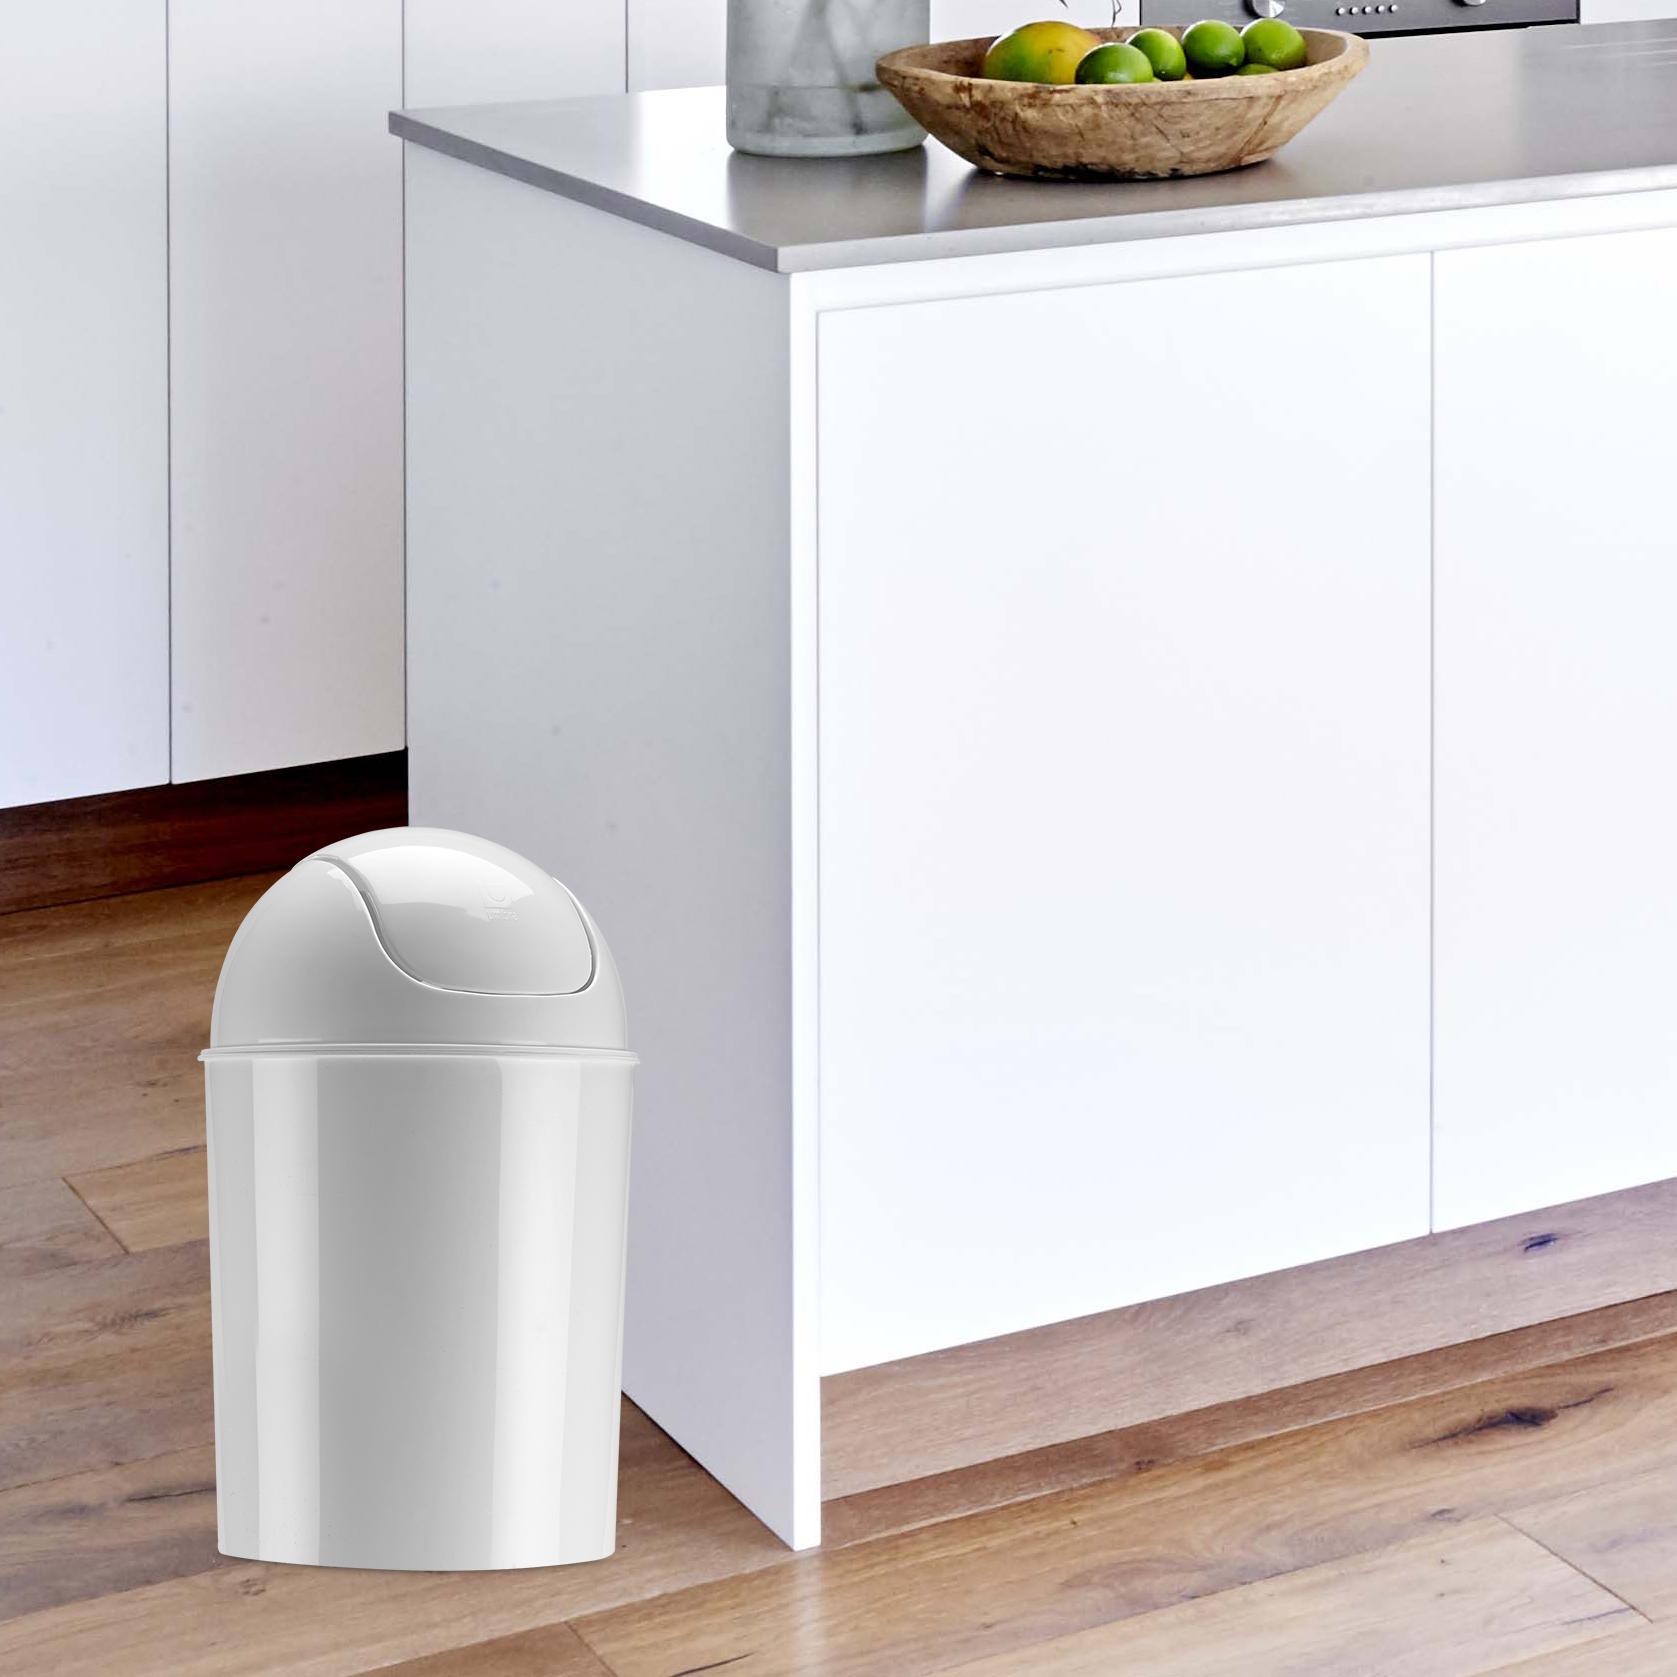 Waste Garbage Basket Trash Can for Bathroom 1 1/2 Gallon Swing Lid ...